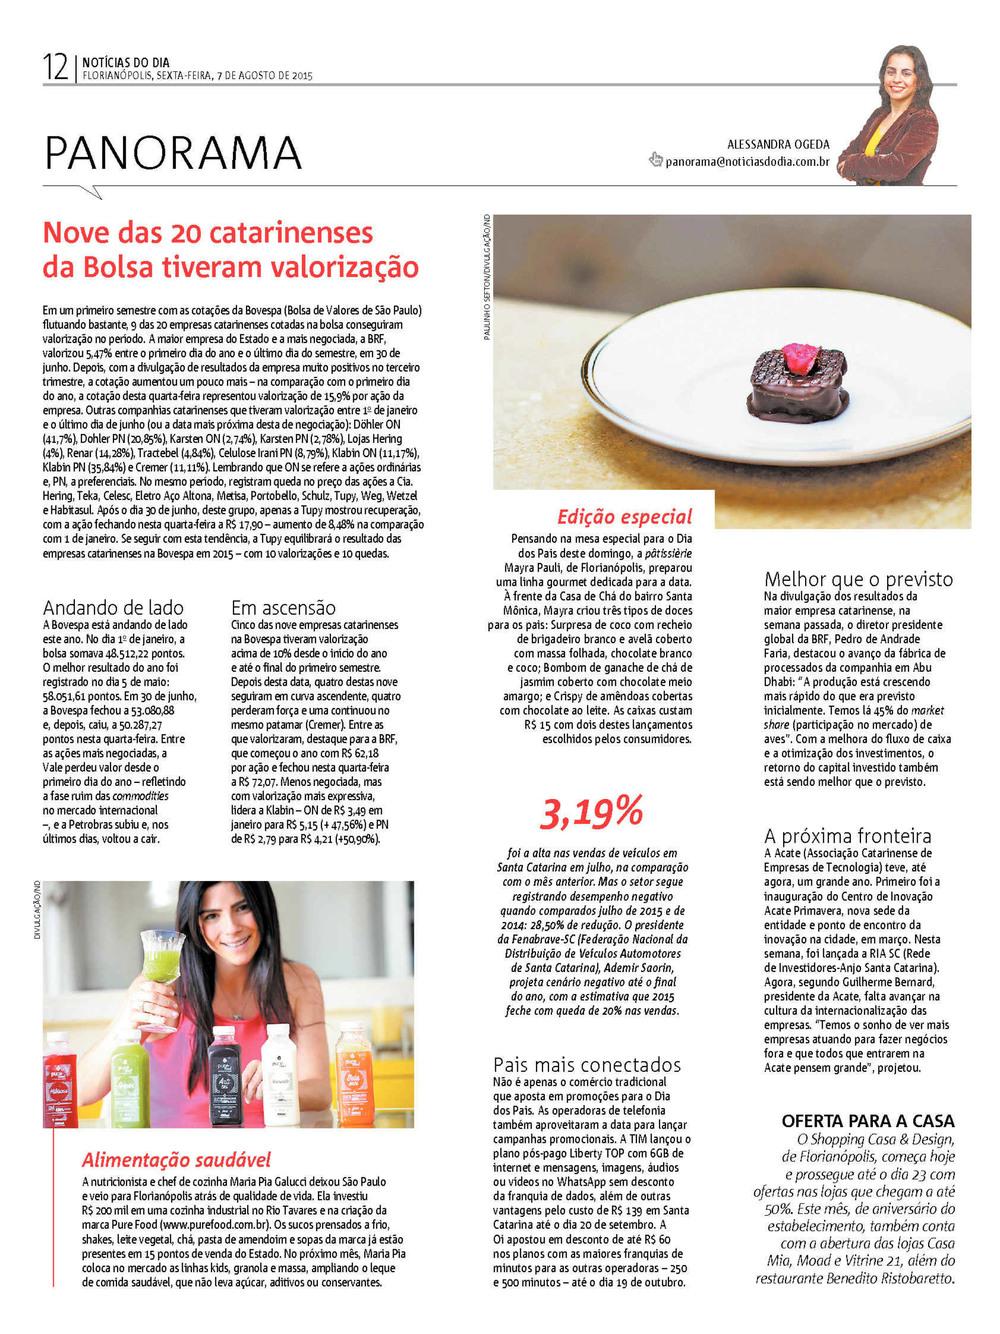 purefood-maria-pia-gallucci-materia-noticias-do-dia-alessandra-ogeda-panorama-alimentacao-saudavel.jpg